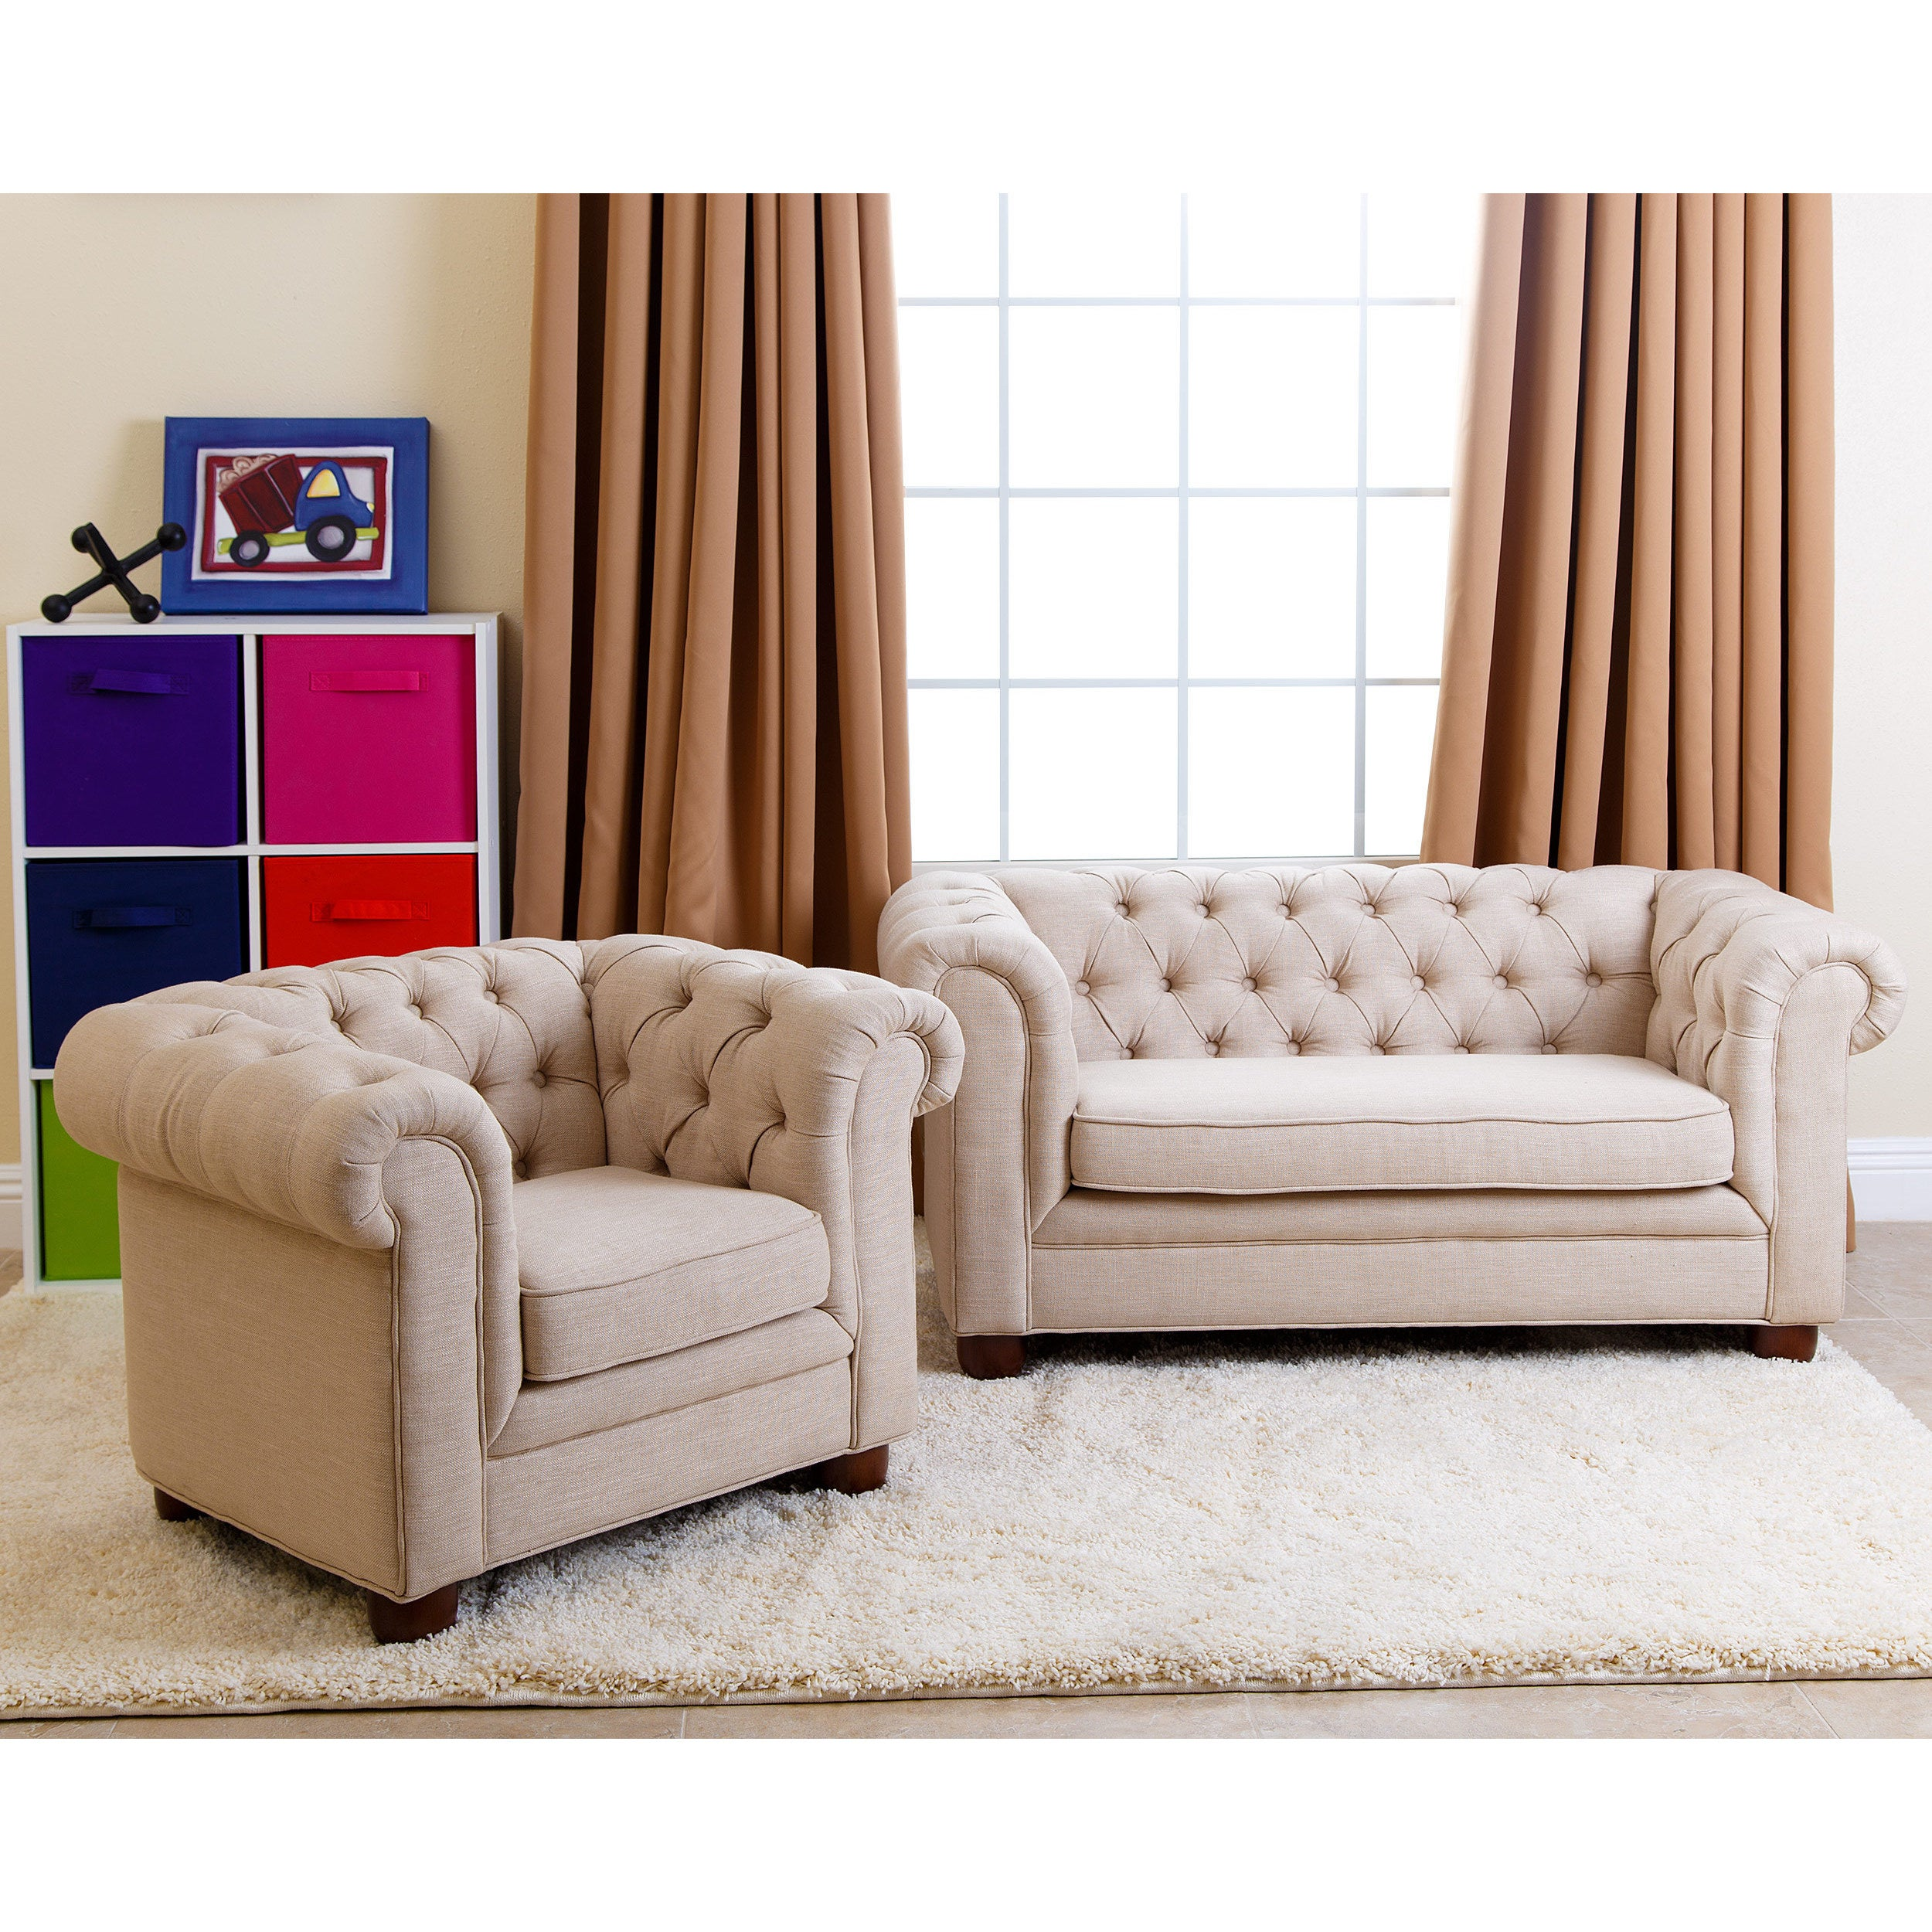 Abbyson Kids Beige Linen Chesterfield RJ Mini Sofa Free Shipping